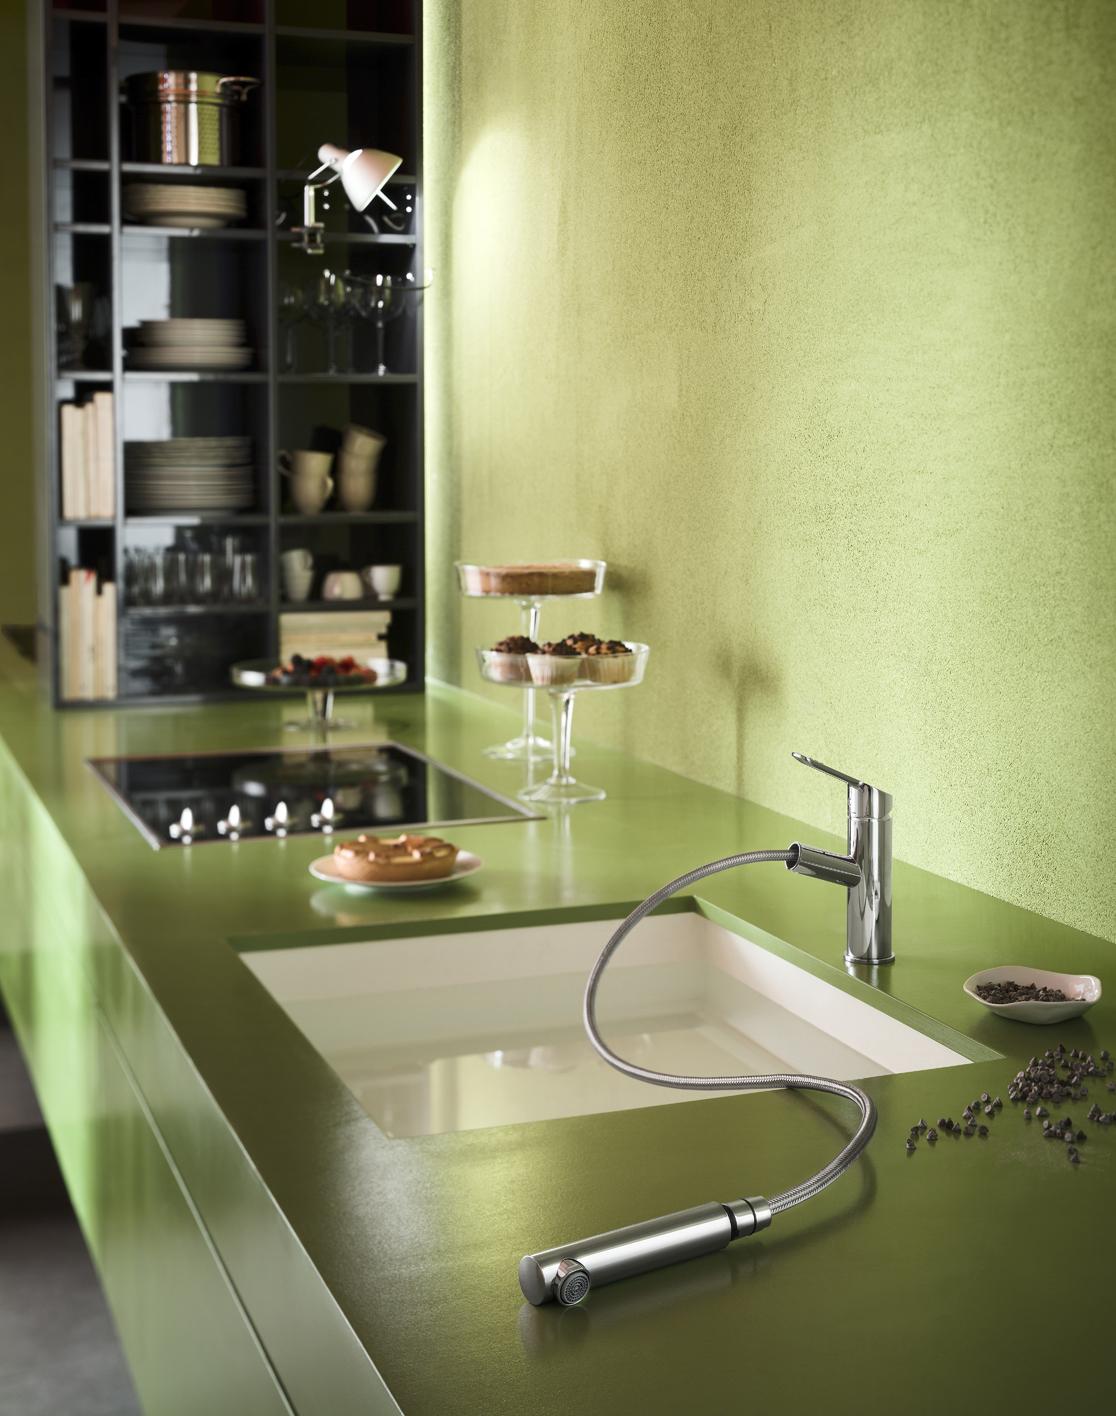 Nobili Rubinetterie - catalogo generale cucina - gallery